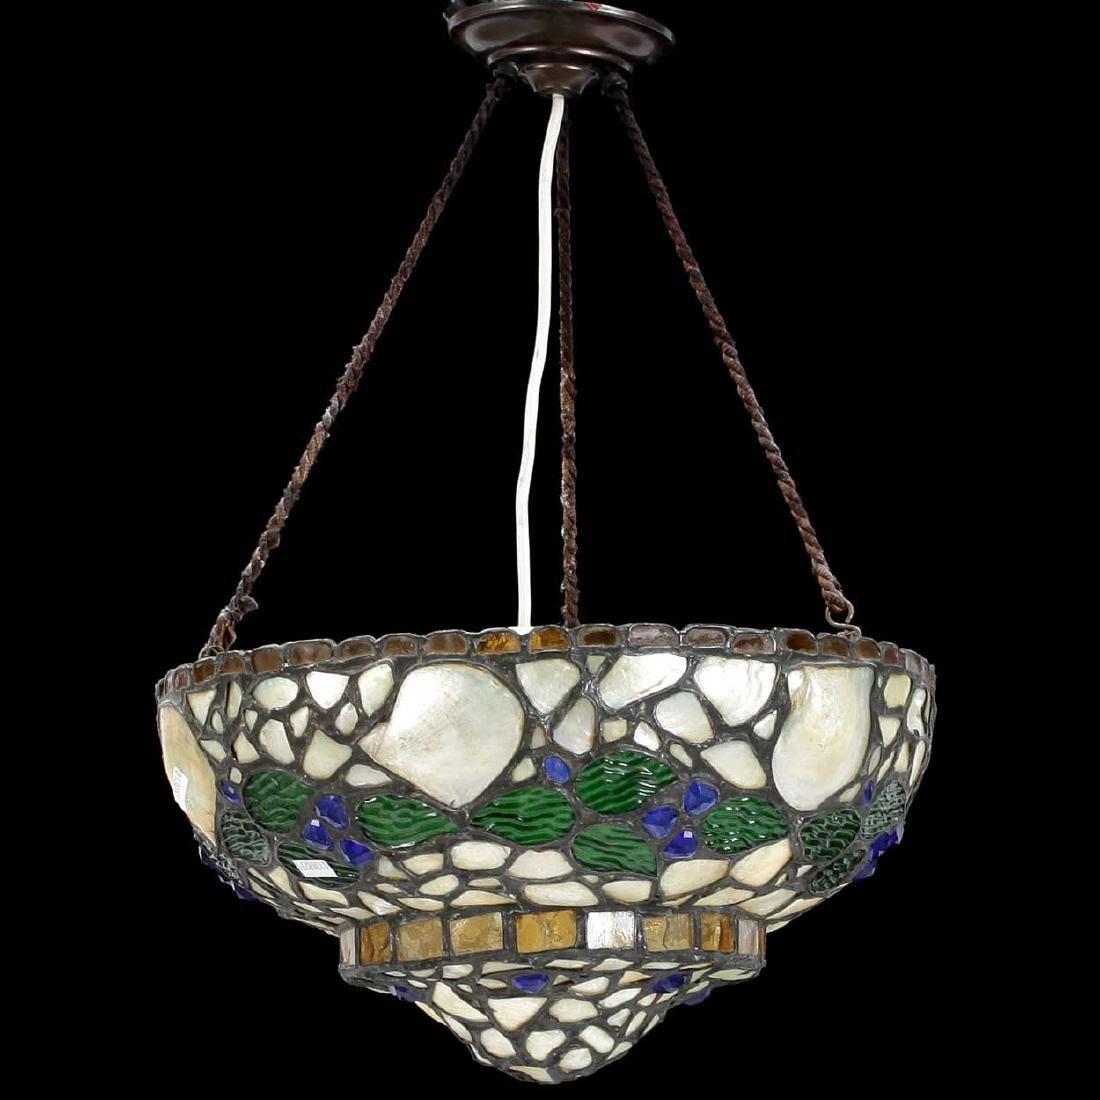 Swedish Glass Mosaic Bowl Pendant Hanging Light Fixture